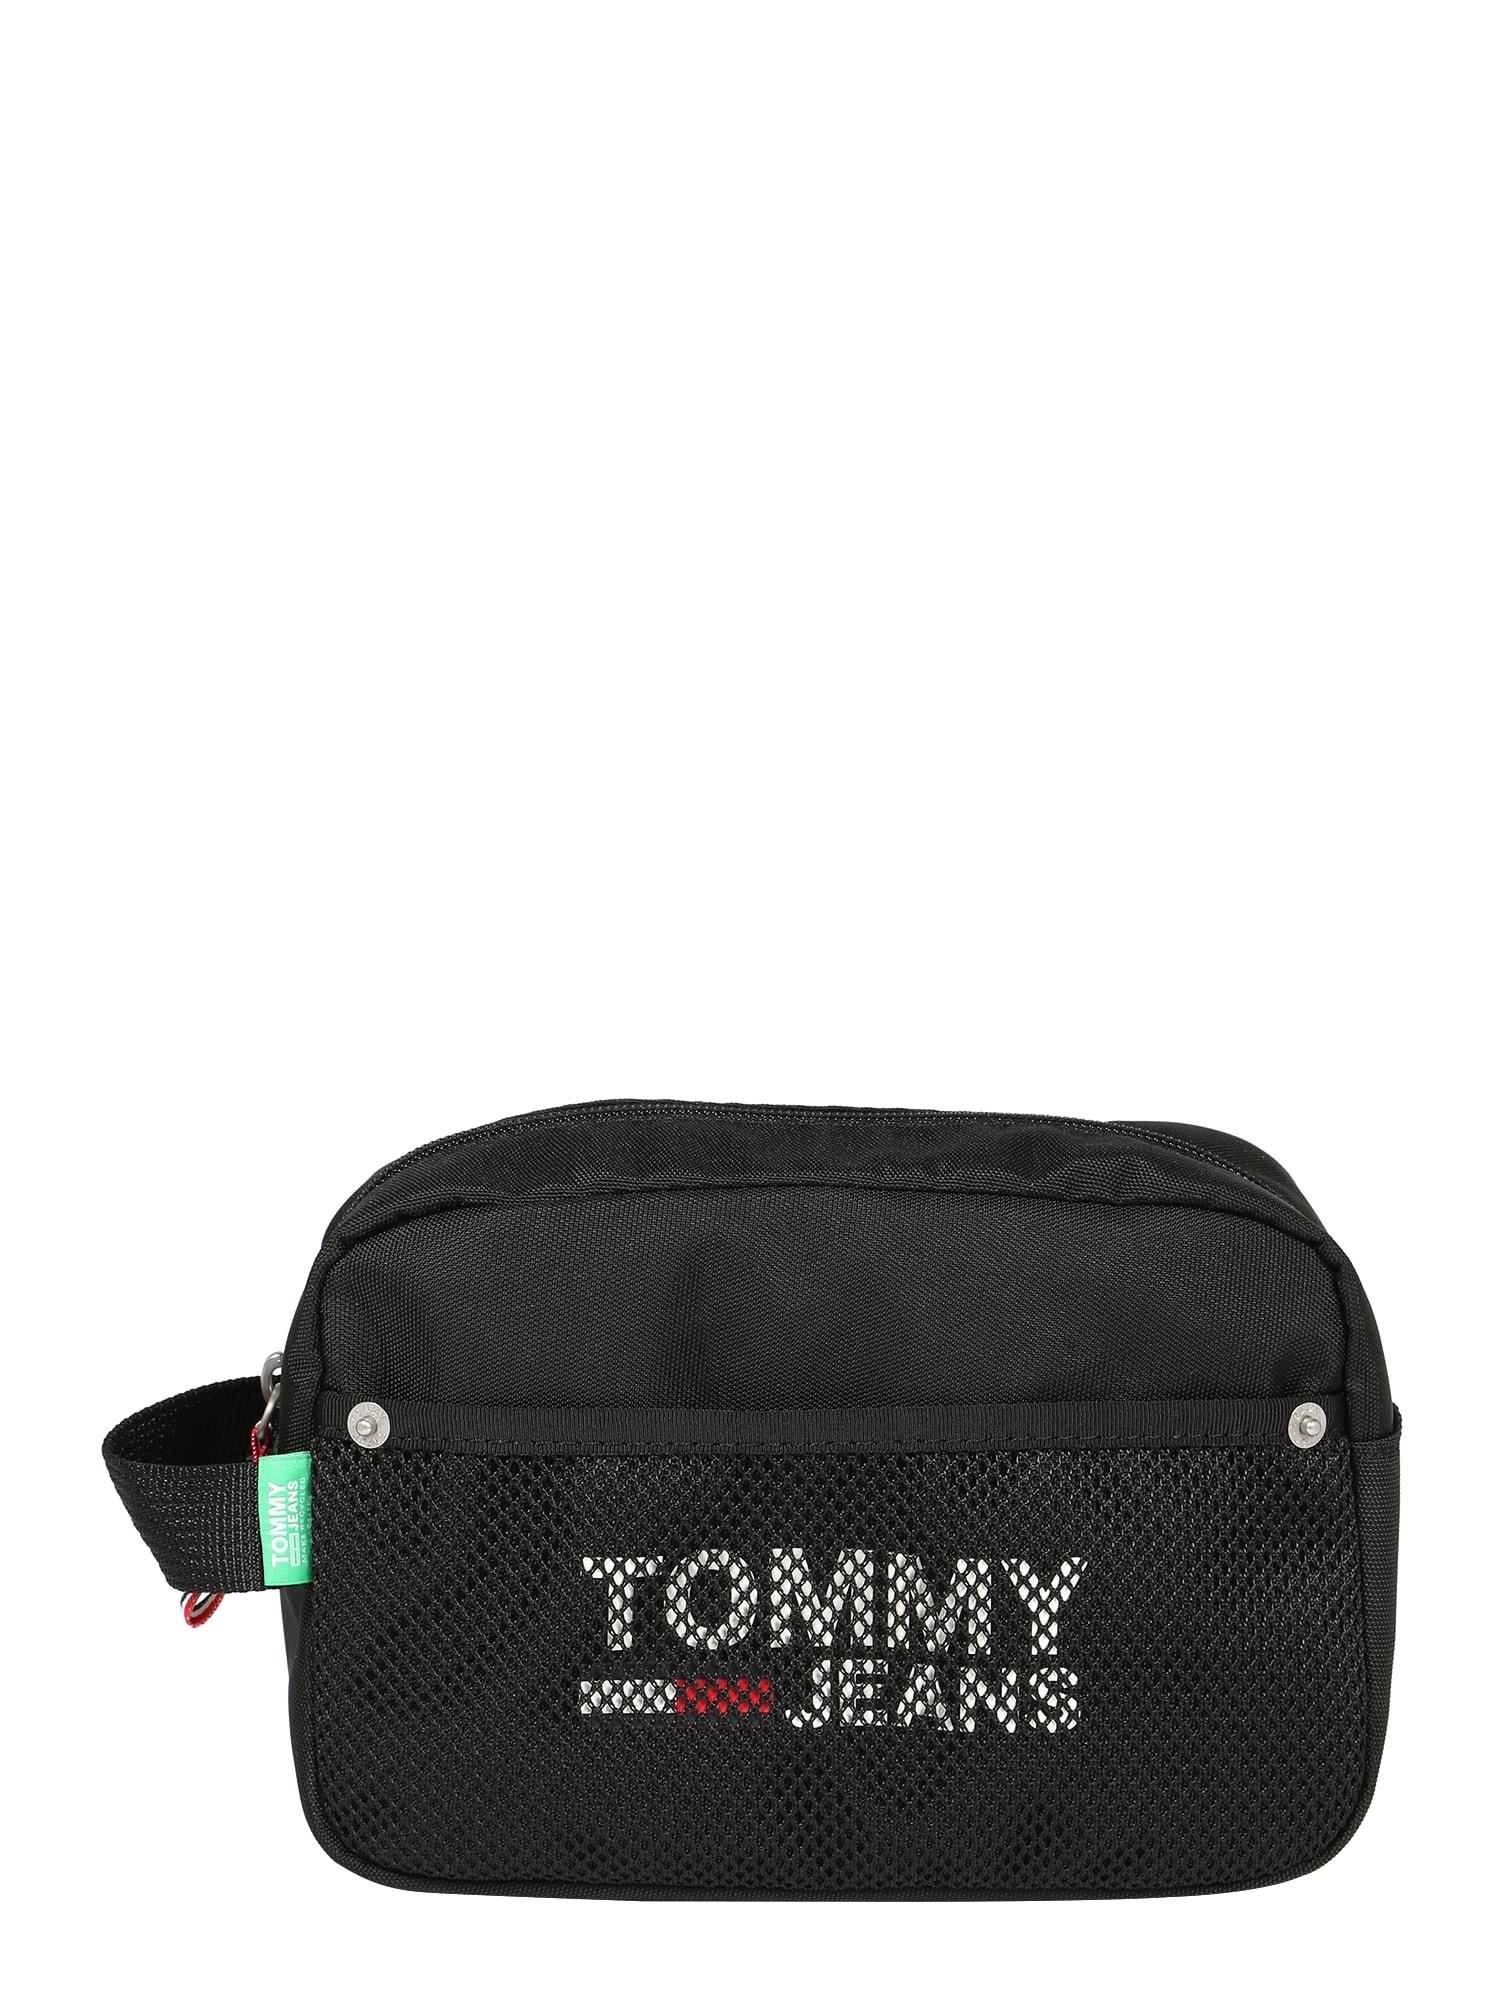 Tommy Jeans Tuoleto reikmenų krepšys 'COOL CITY' juoda / balta / raudona